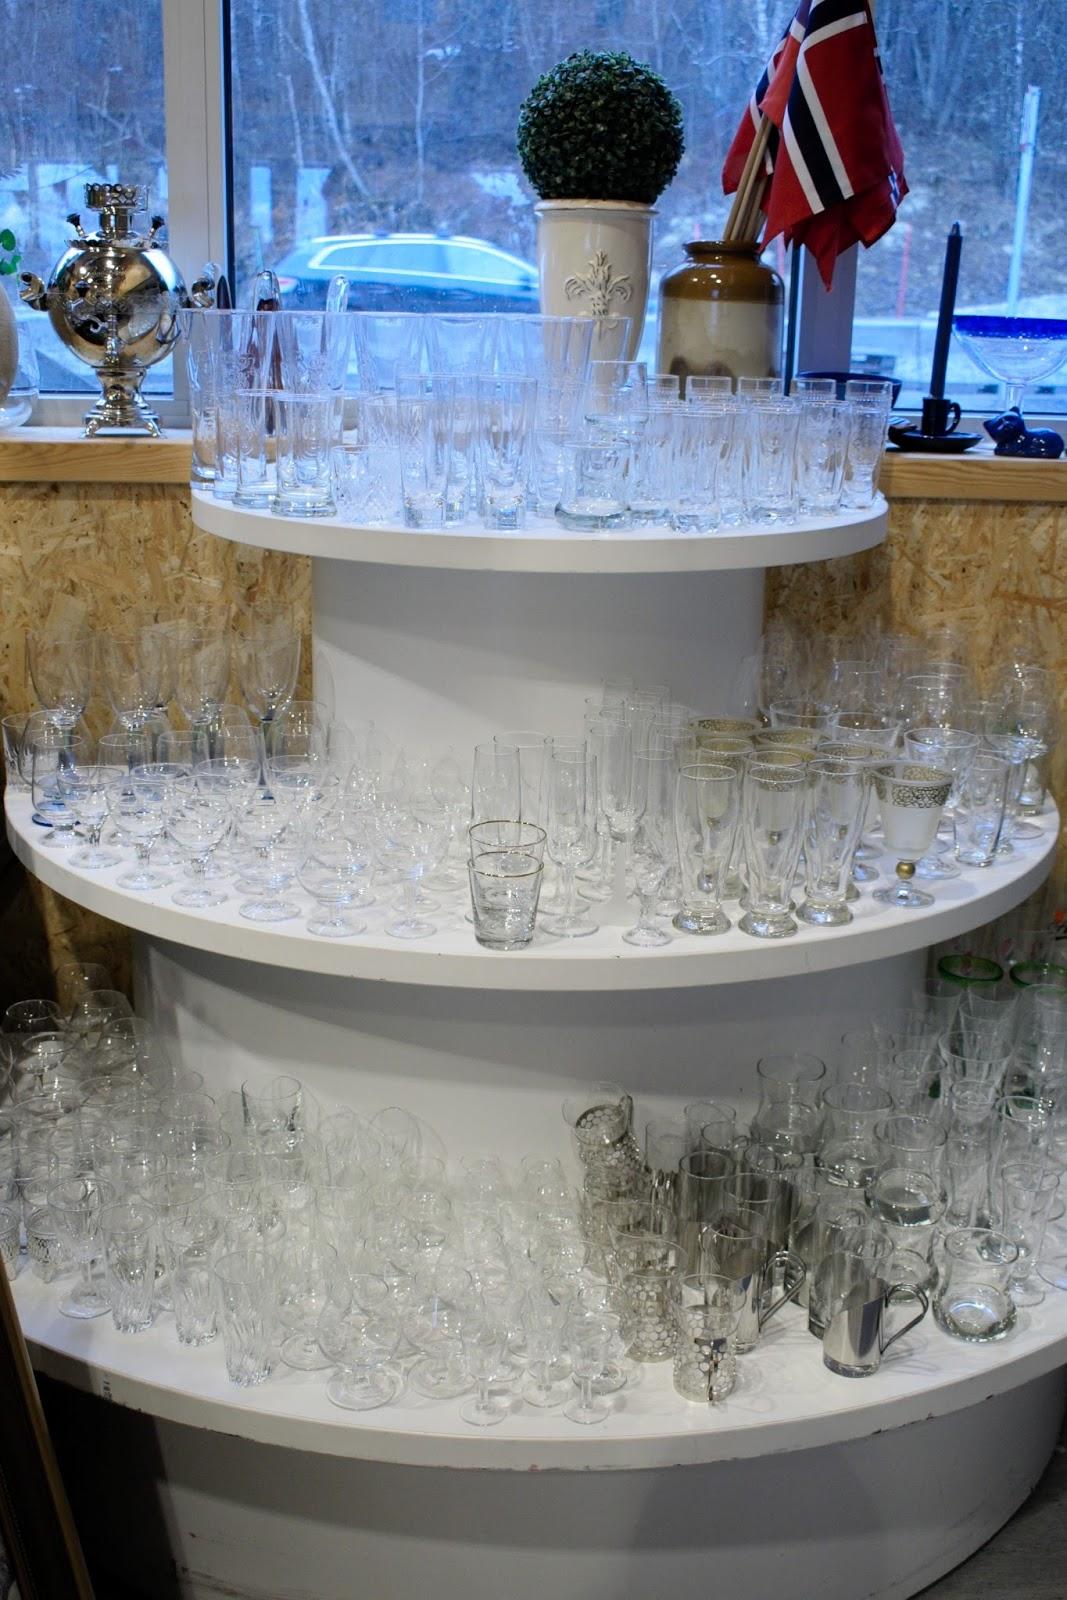 a00a01283fc1 Bruktikken på havna.  50% PÅ ALLE GLASS I DAG!!